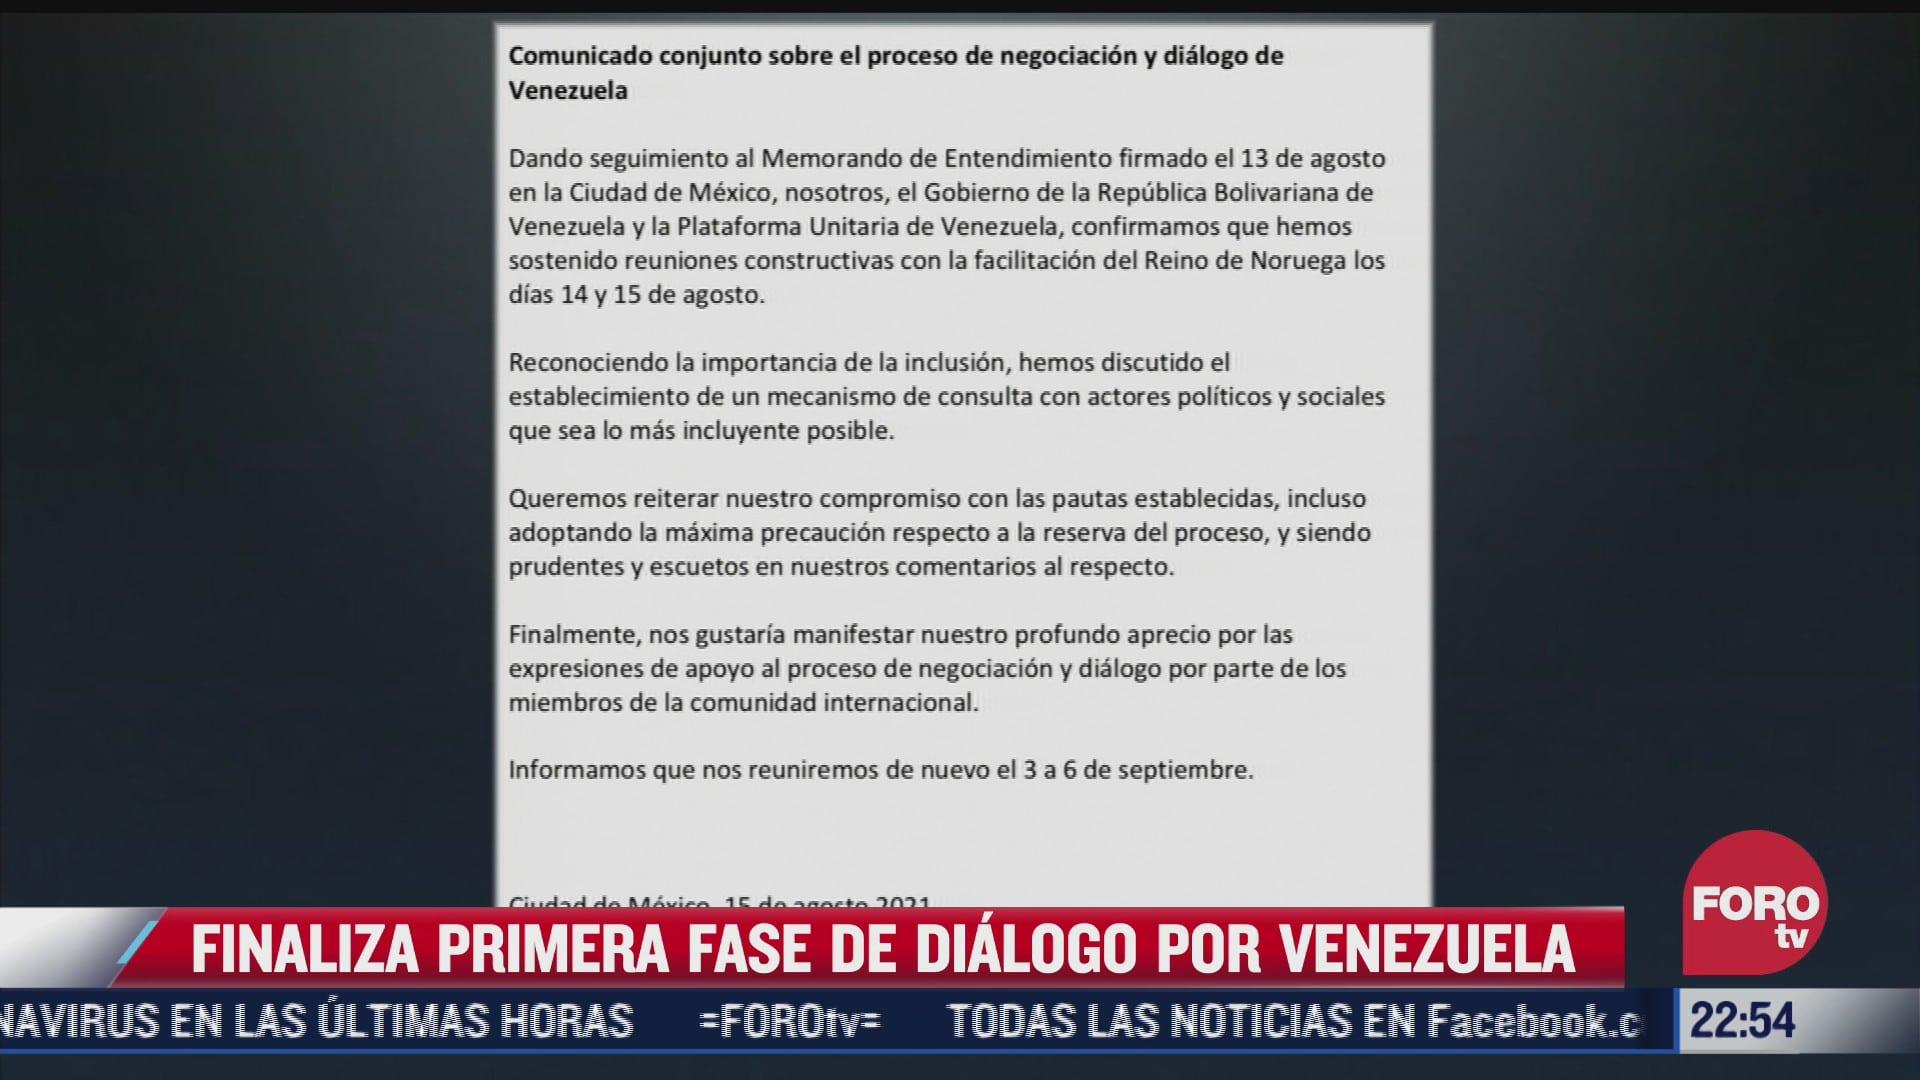 finaliza primera fase de dialogo por venezuela